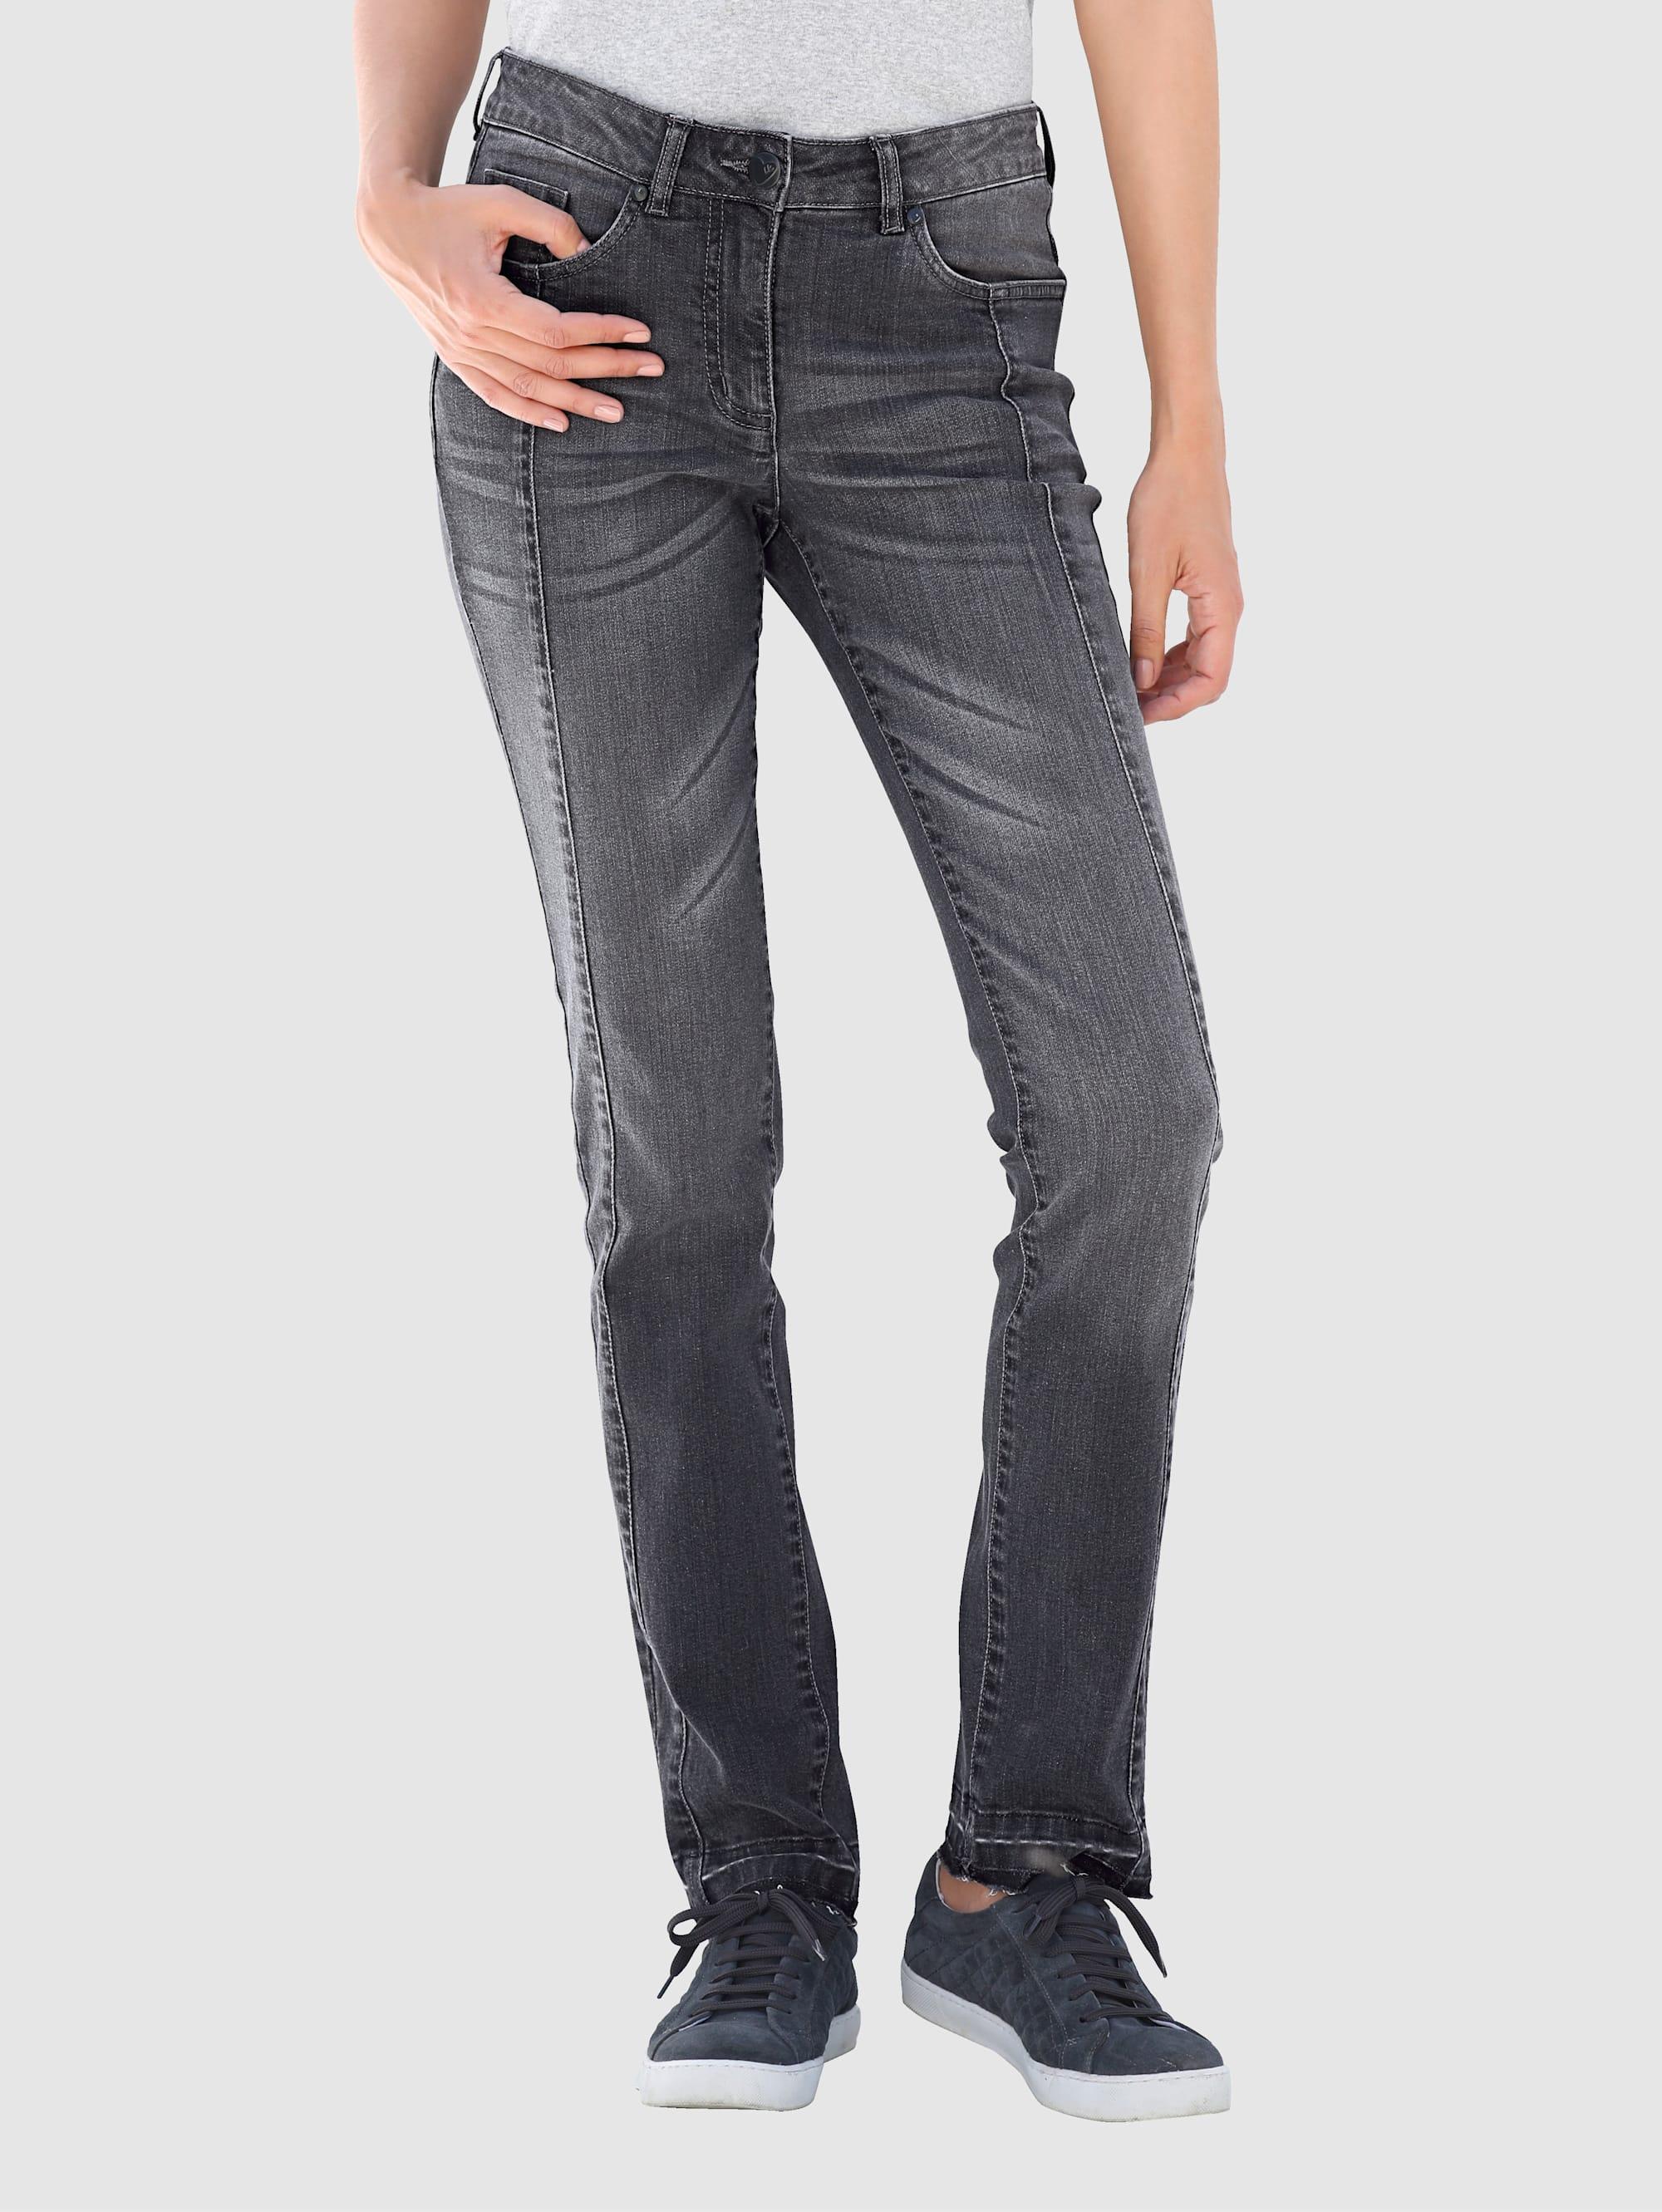 Laura Kent Jeans Laura Slim - in modischer Waschung JNP3b 0on2S